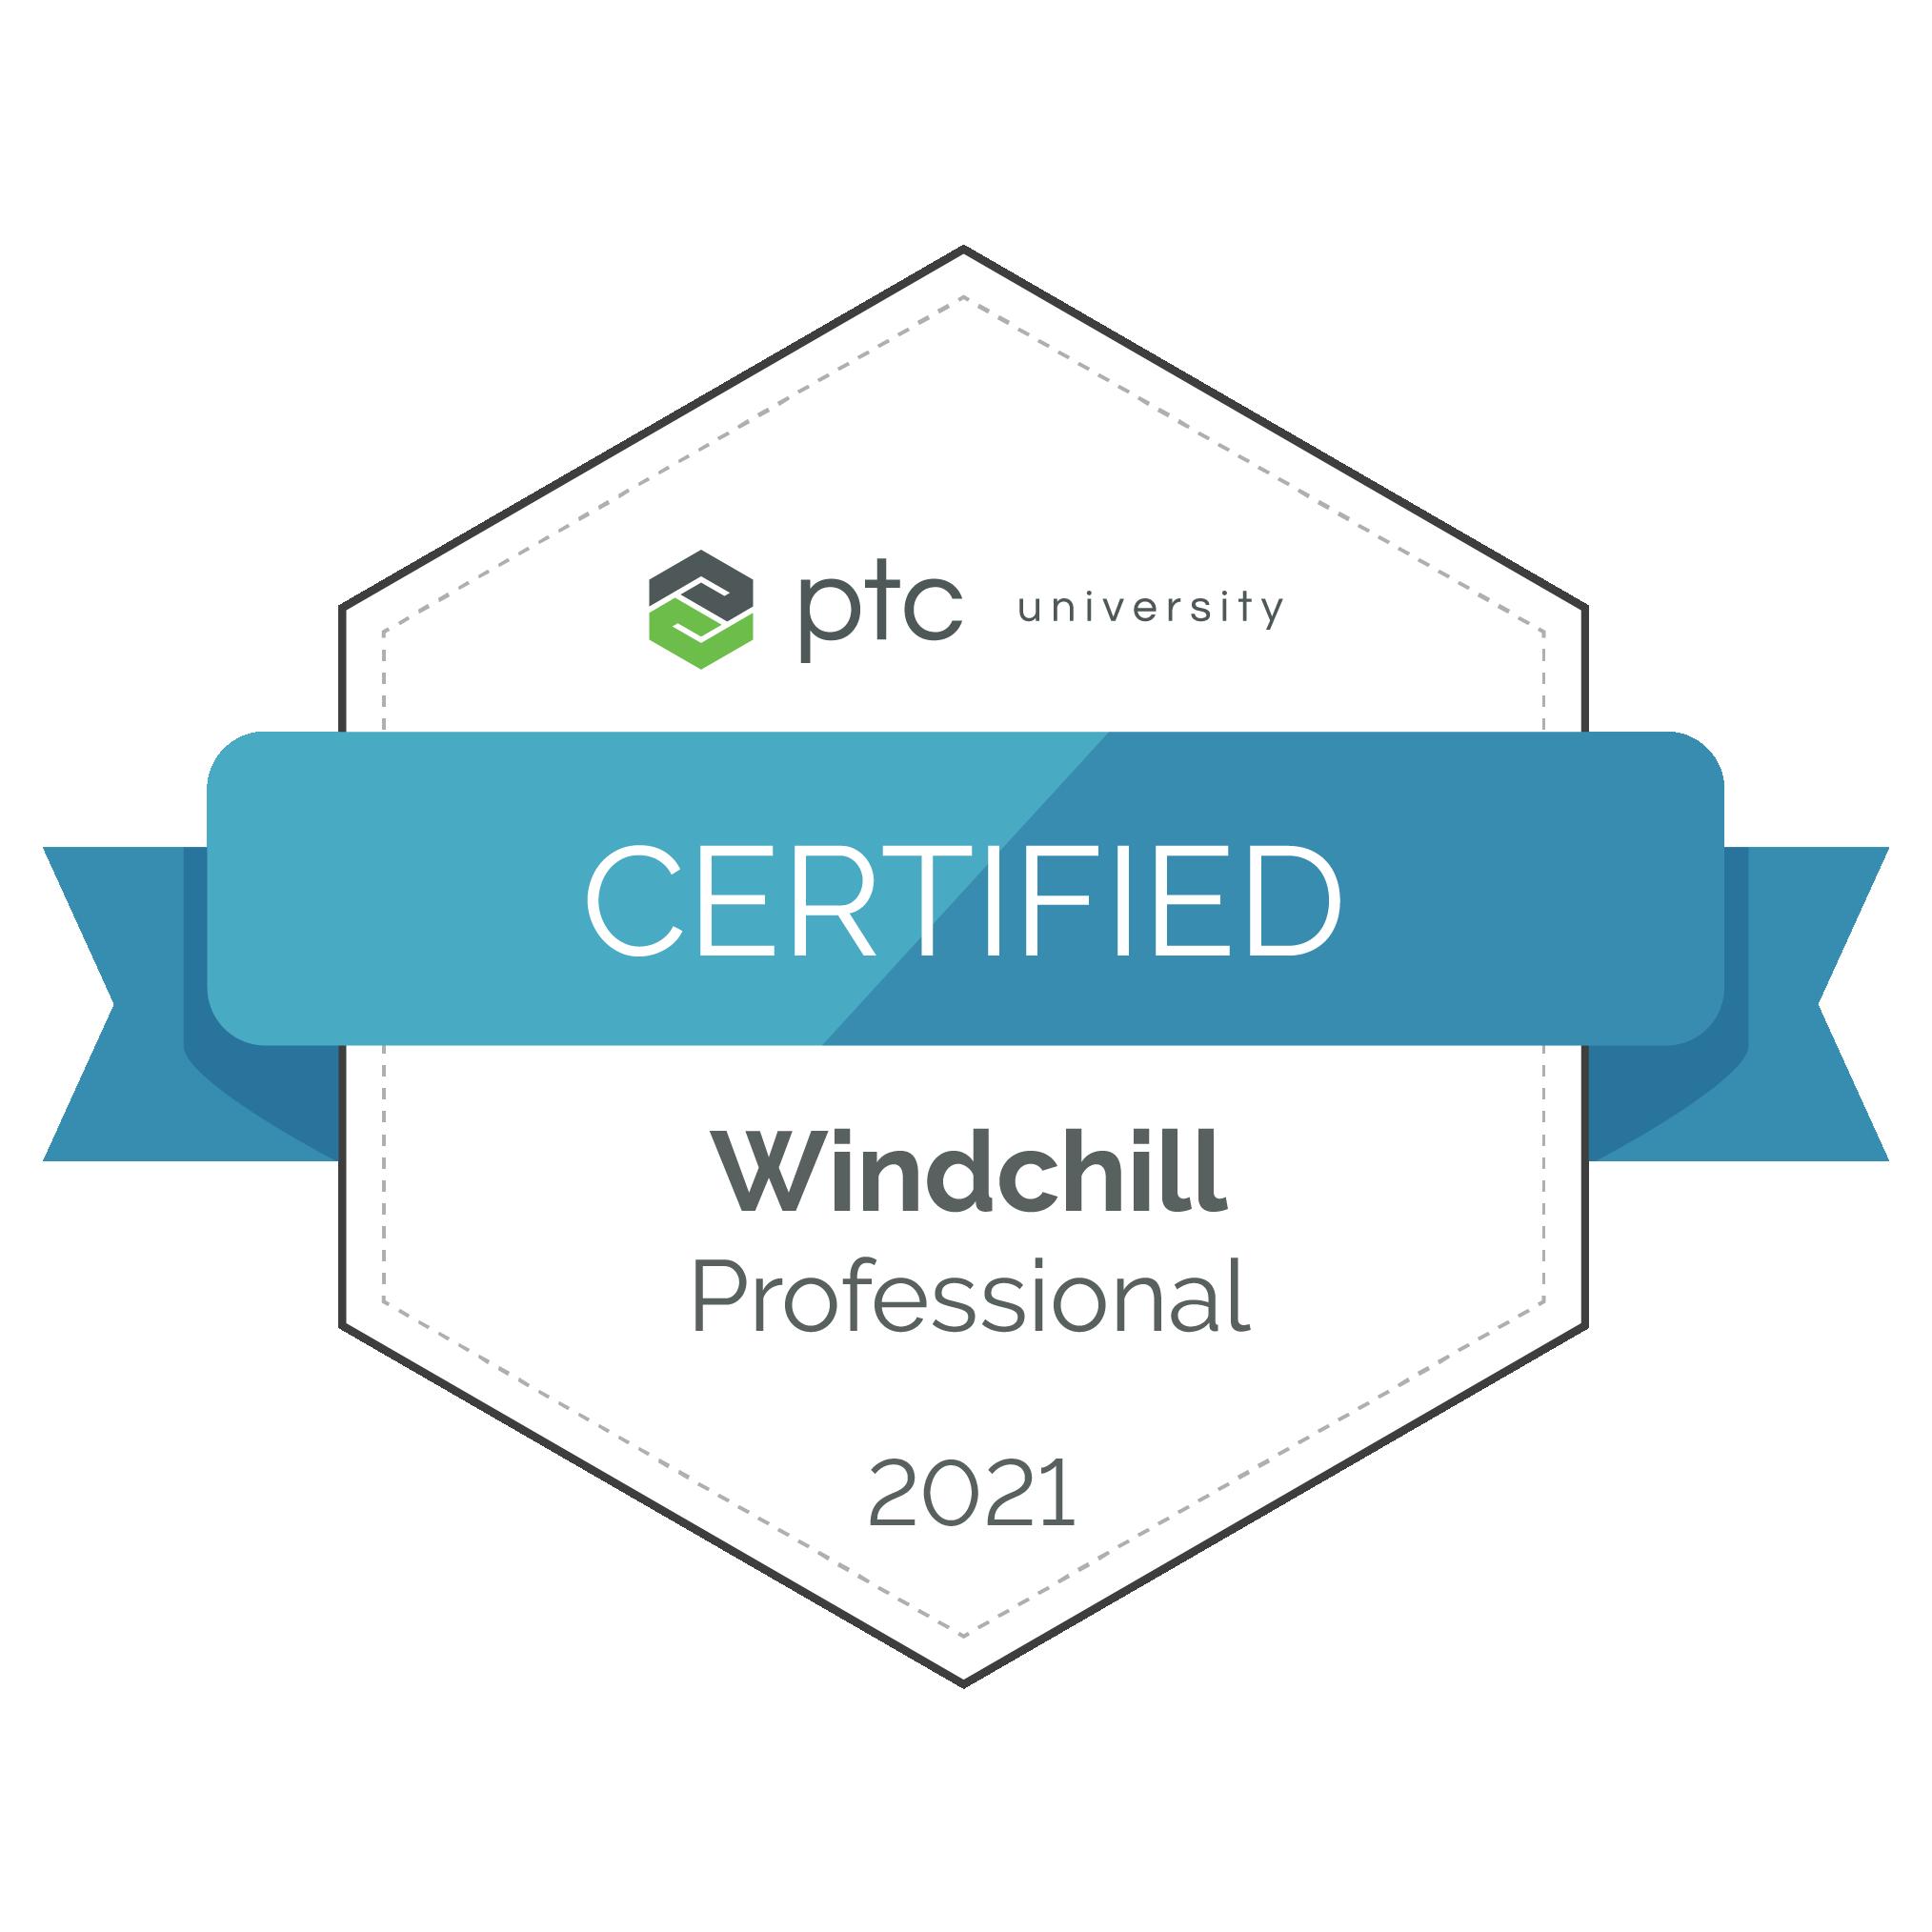 Windchill Professional Certification 2021